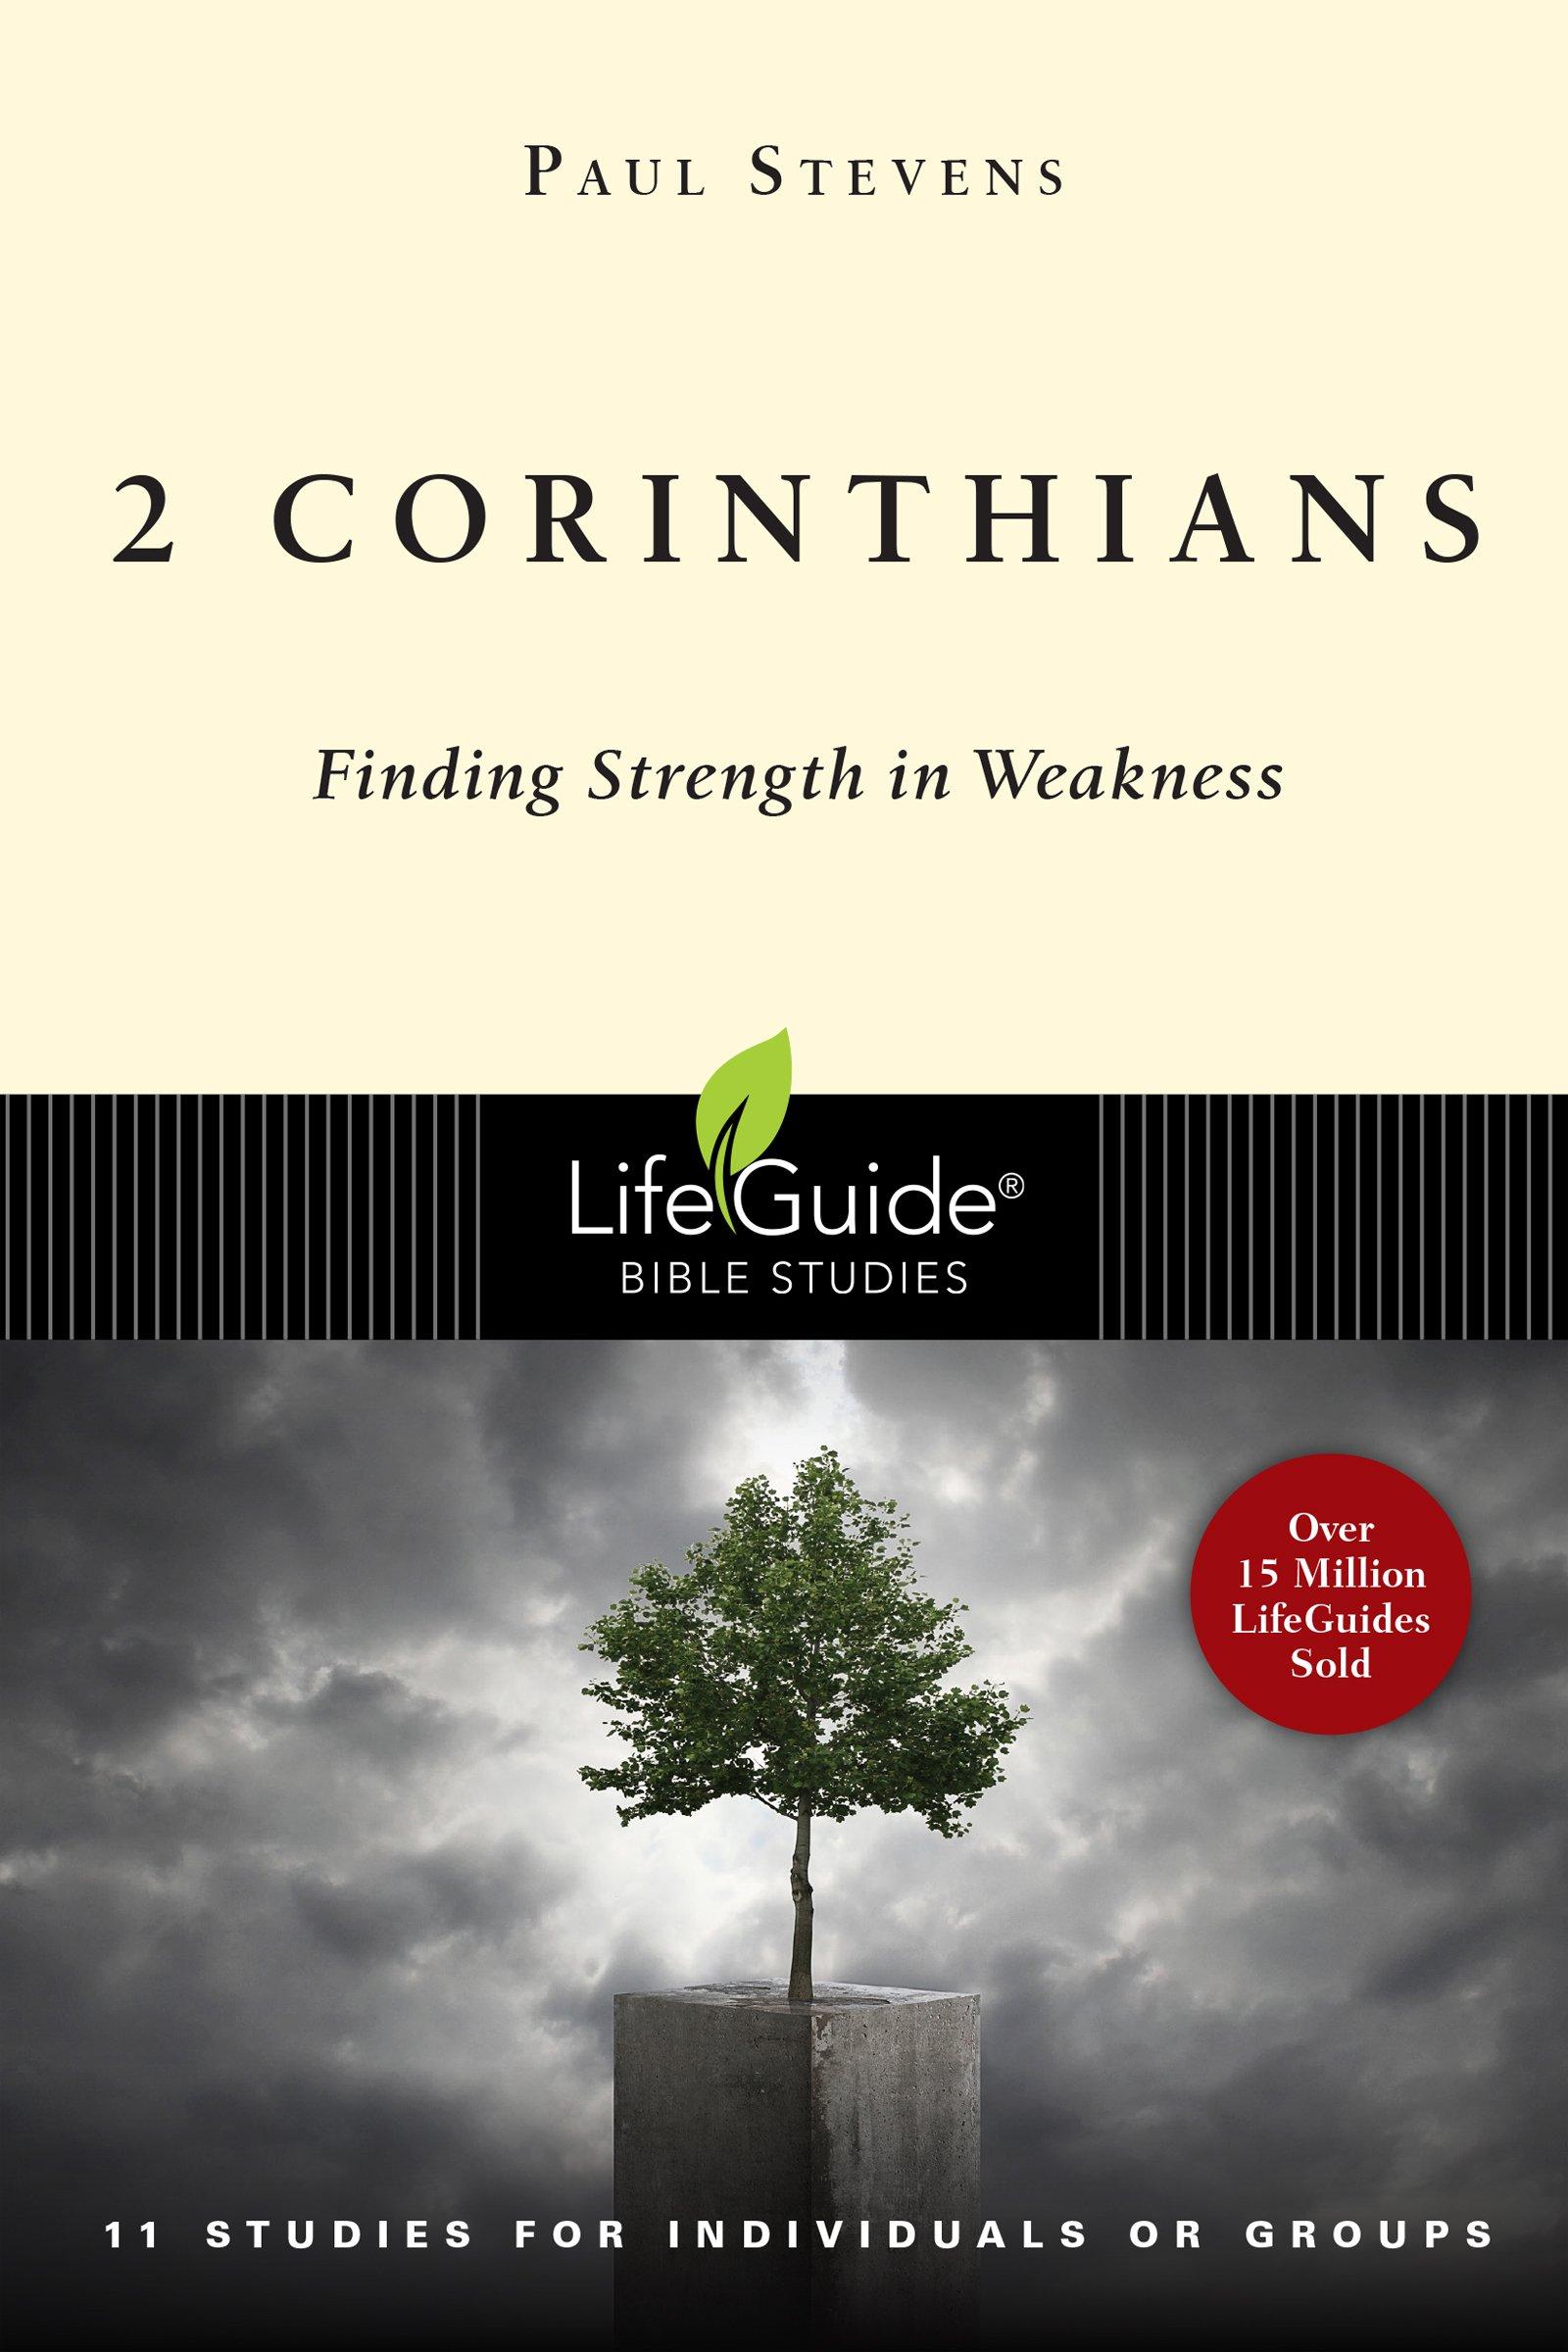 2 Corinthians: Finding Strength in Weakness (Lifeguide Bible Studies) PDF ePub ebook